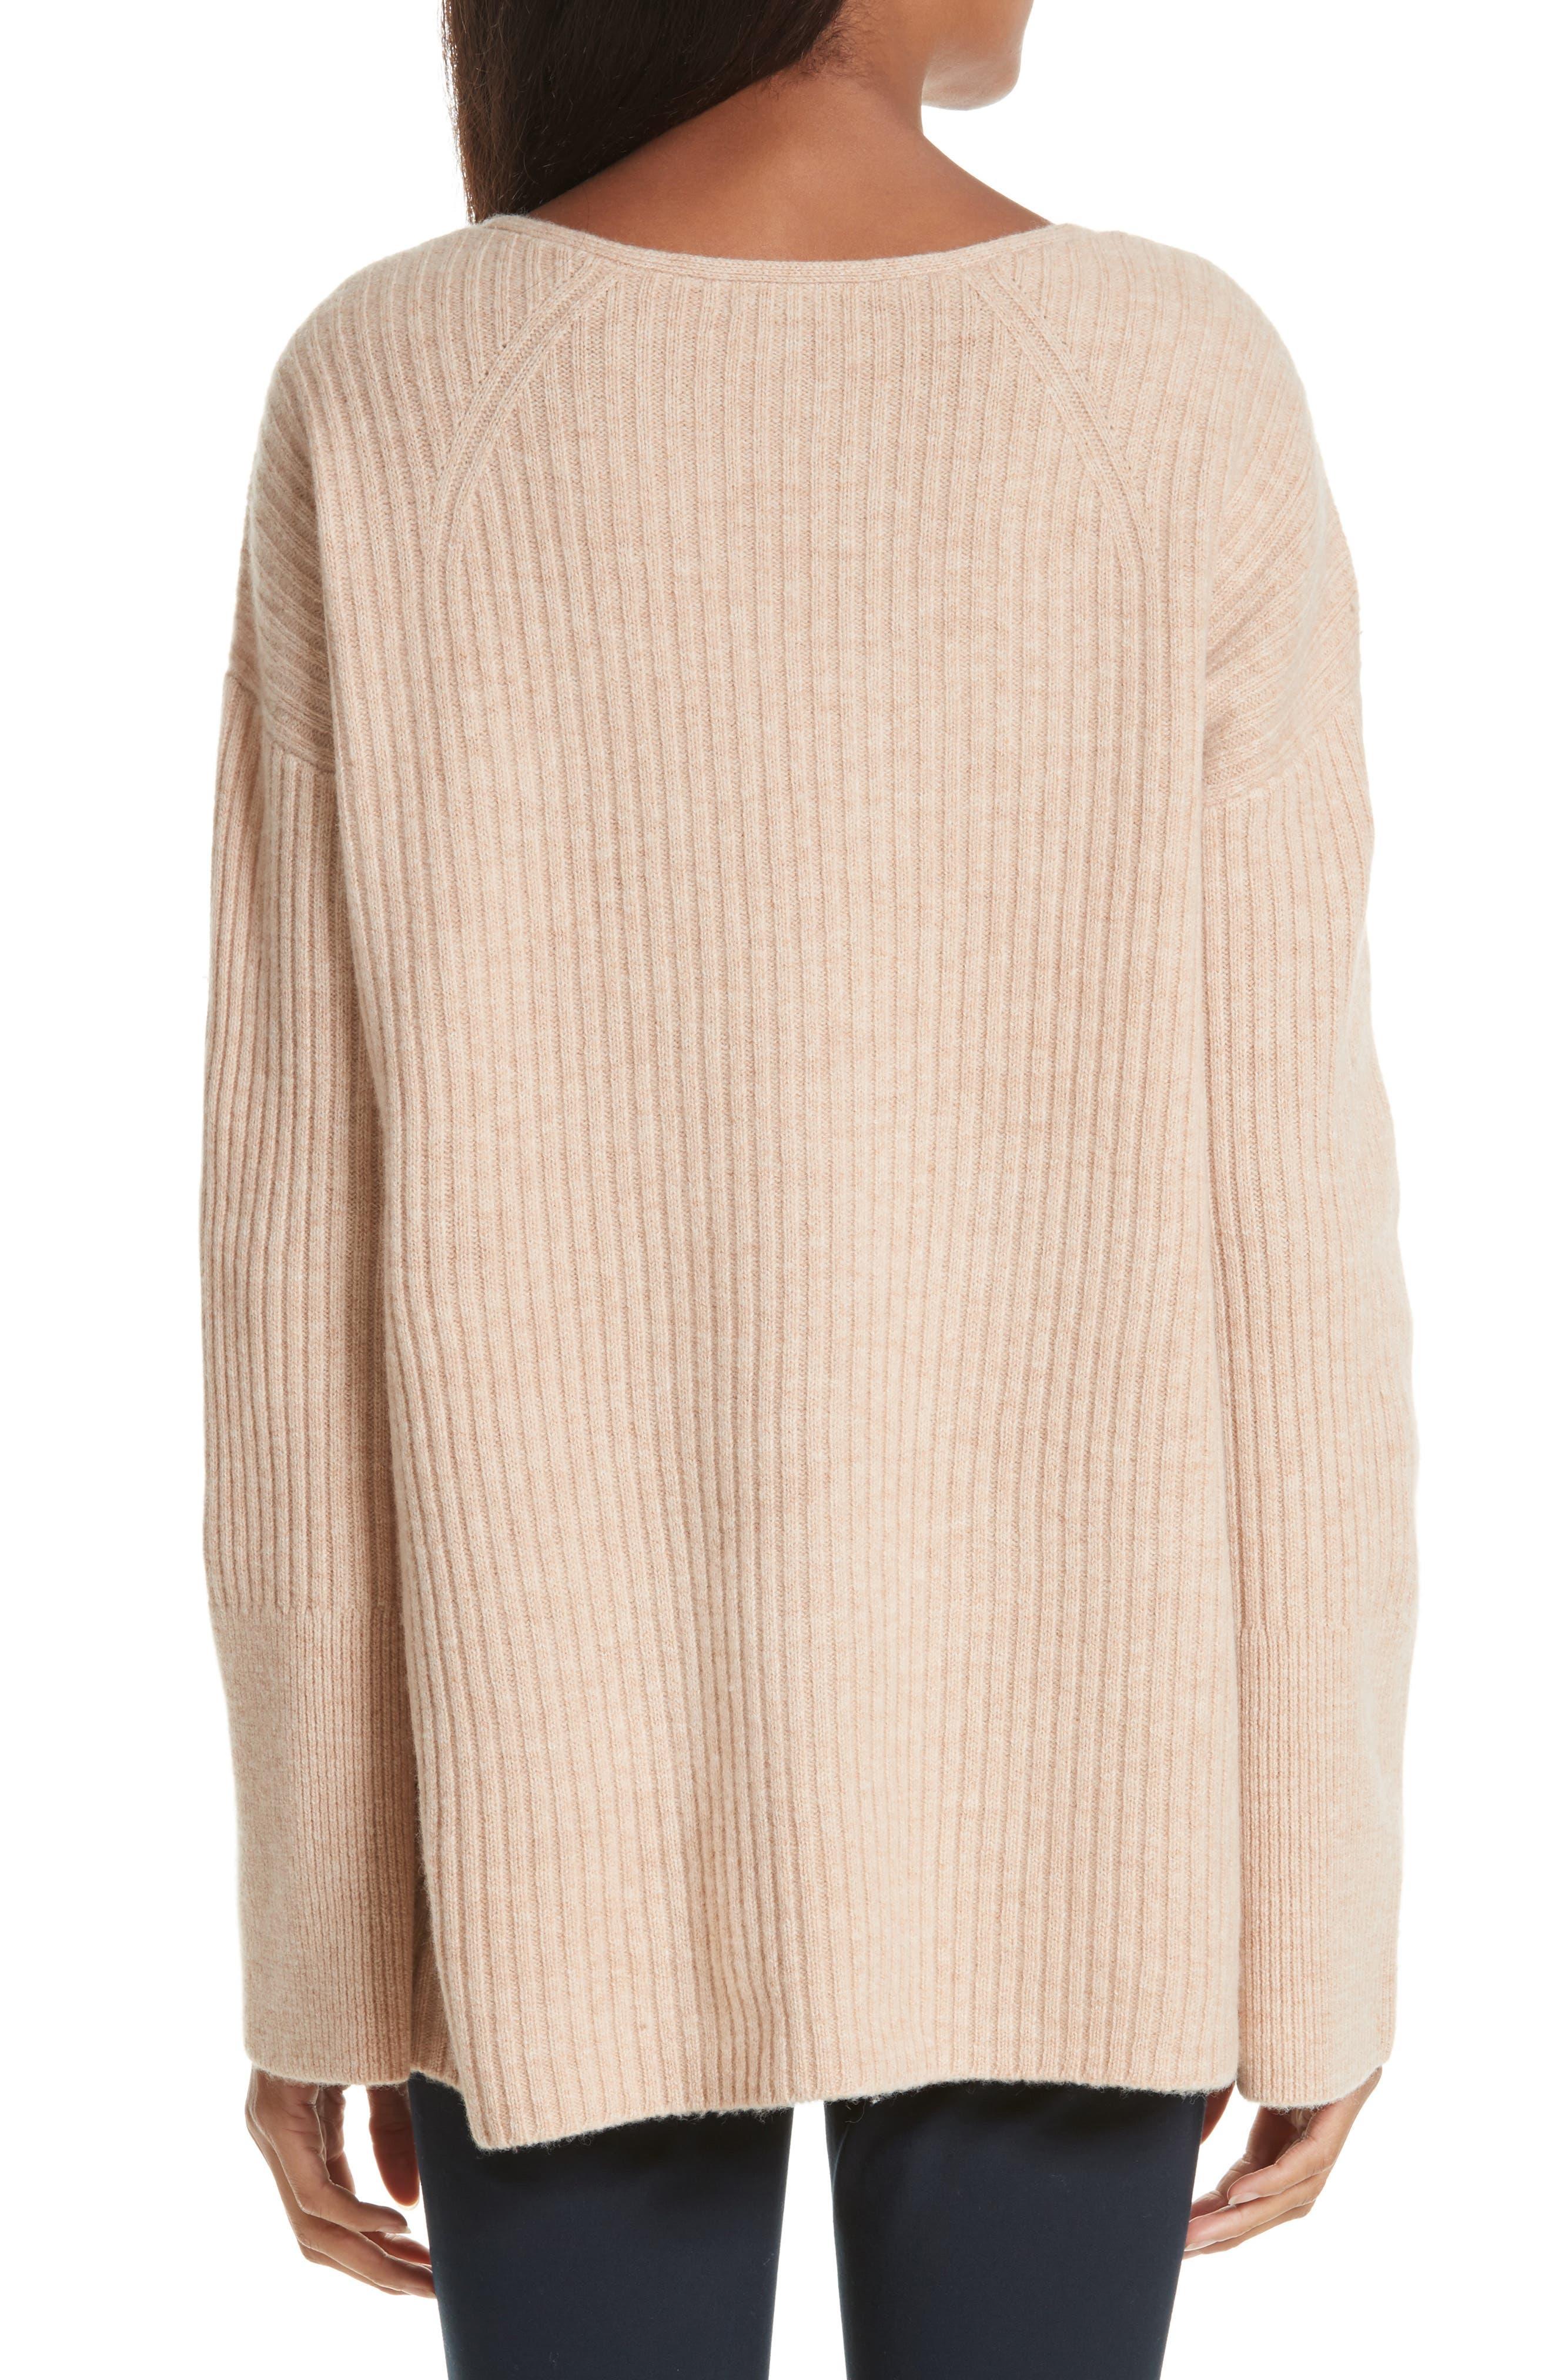 Mitchell Merino Wool Sweater,                             Alternate thumbnail 2, color,                             Oat